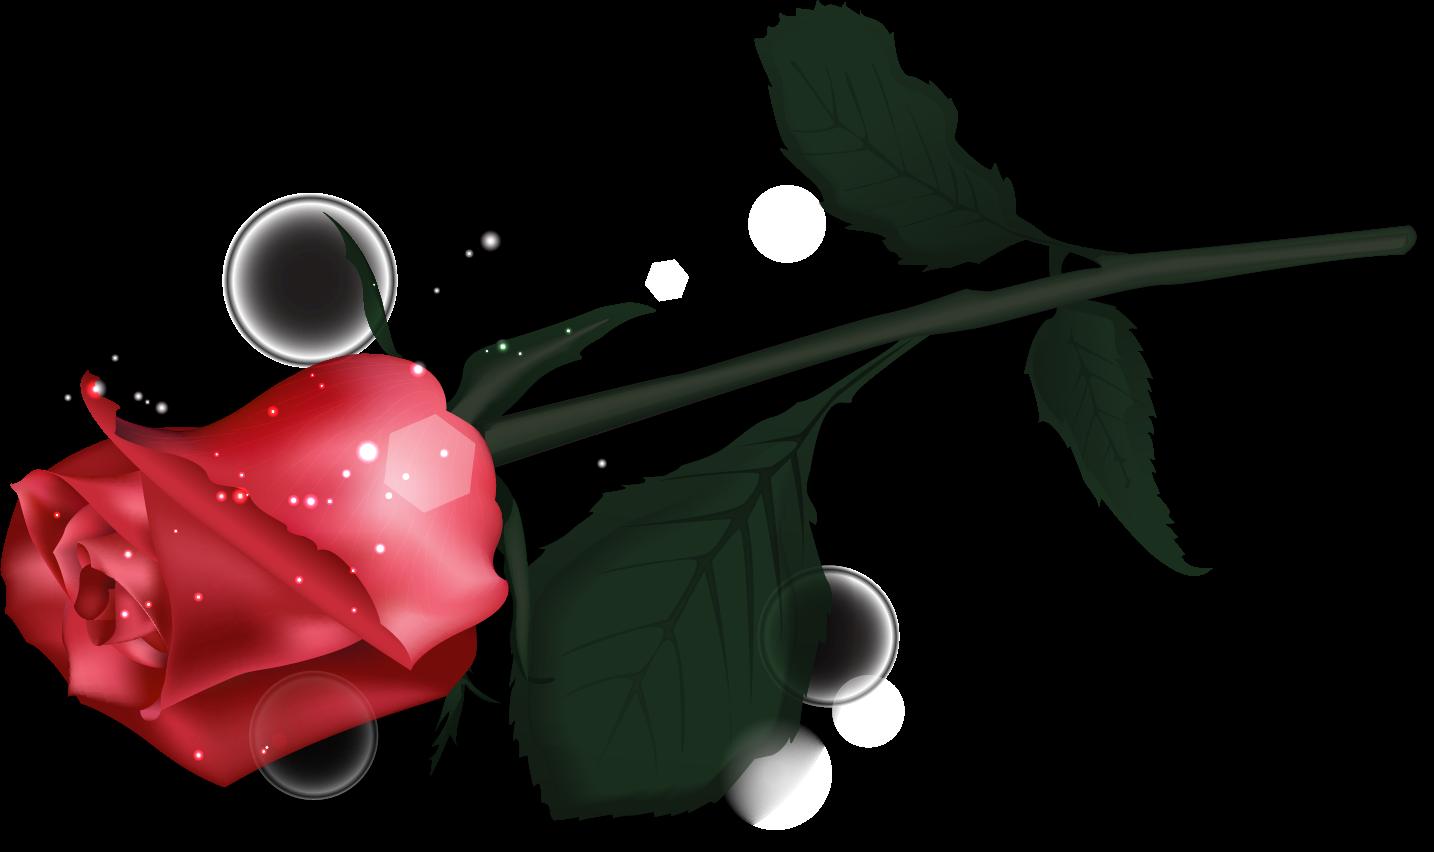 Картинки по запросу картинки-клипарт-роза и перо